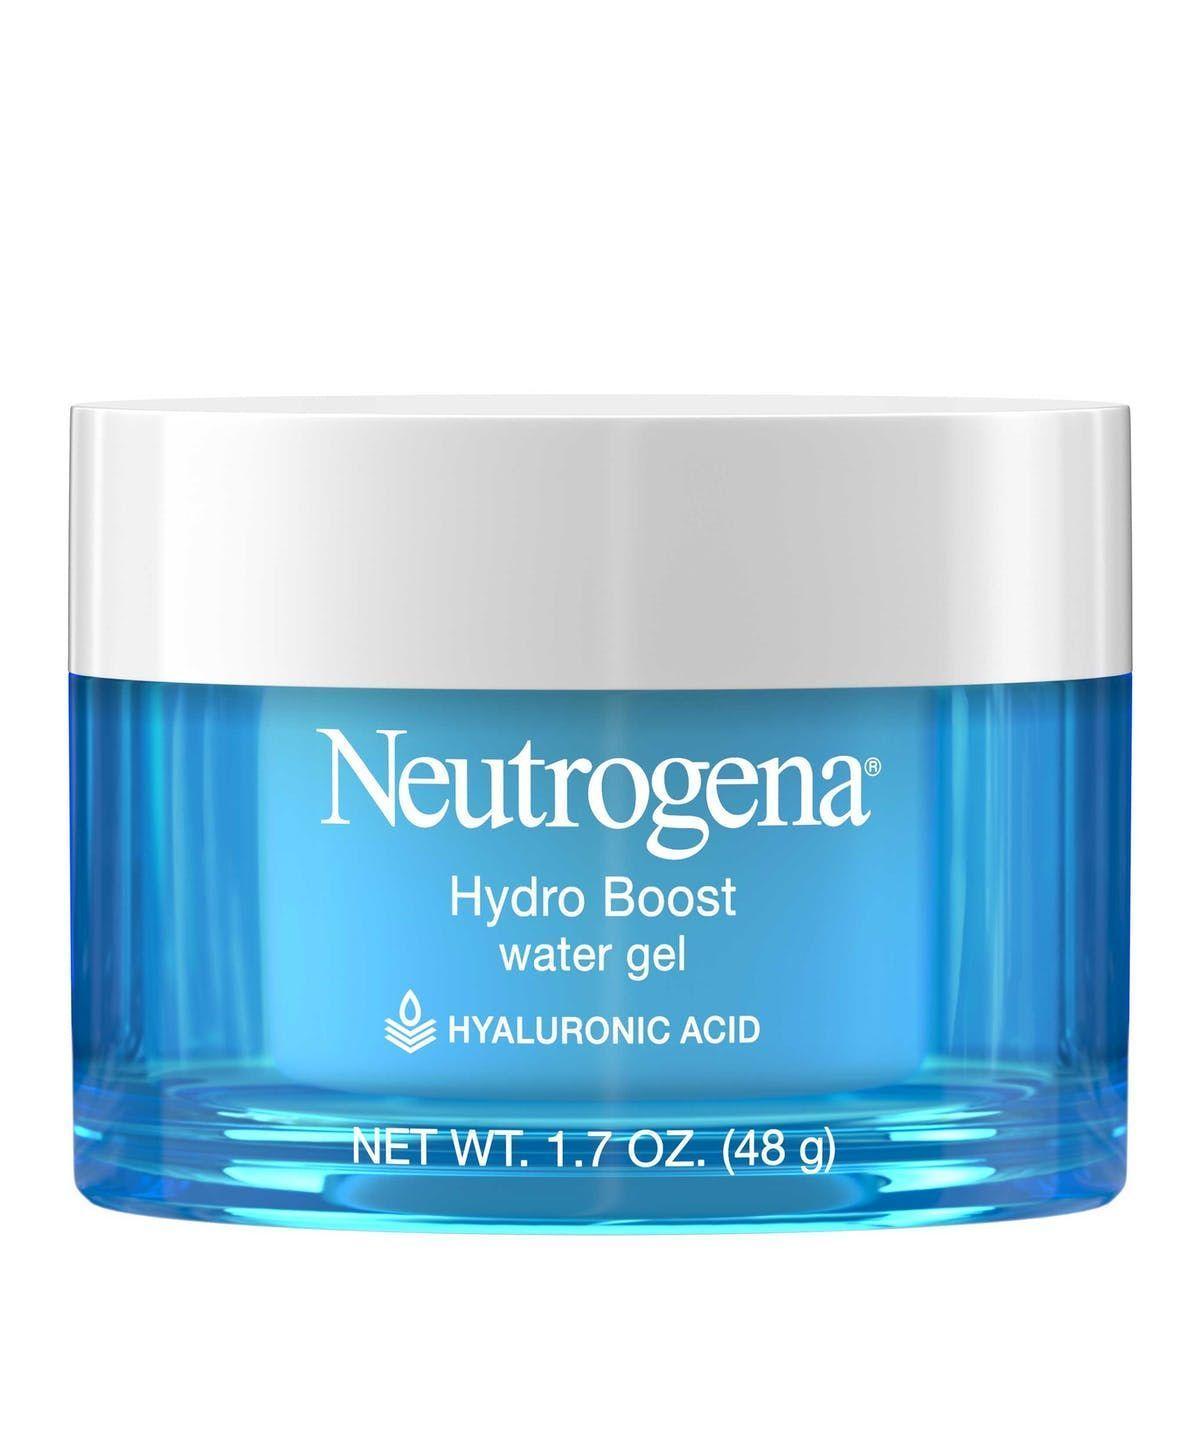 Neutrogena hydroboost